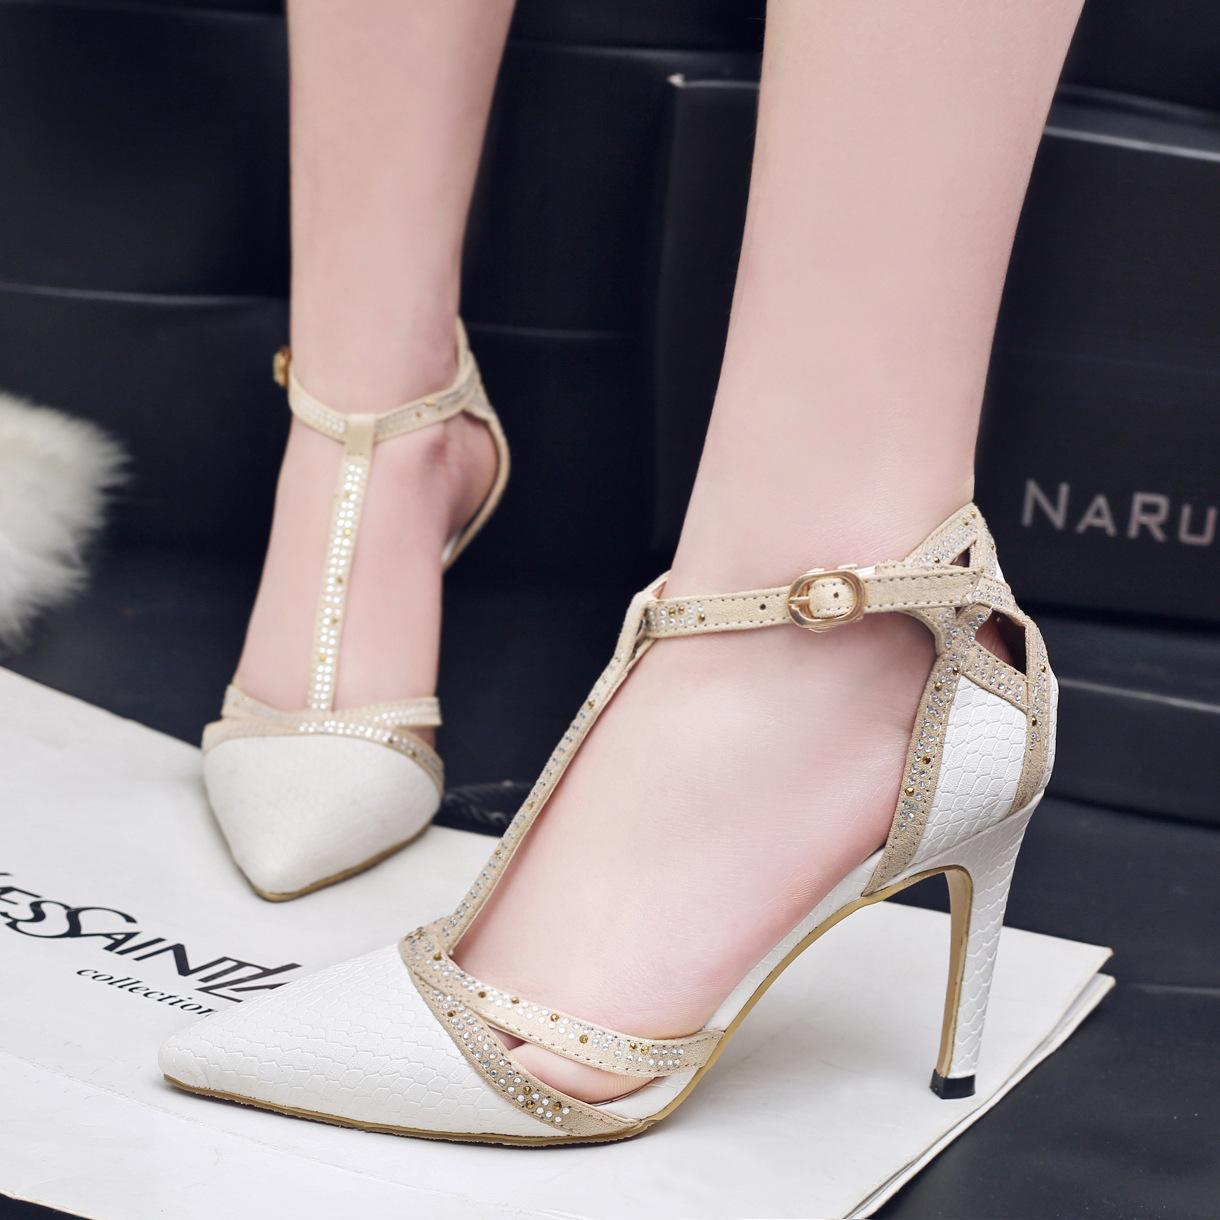 Elegant Bridal Wedding Shoes T Strap High Heel Rhinestone Princess Snake Skin Faux Leather Women Sandals Street Inexpensive